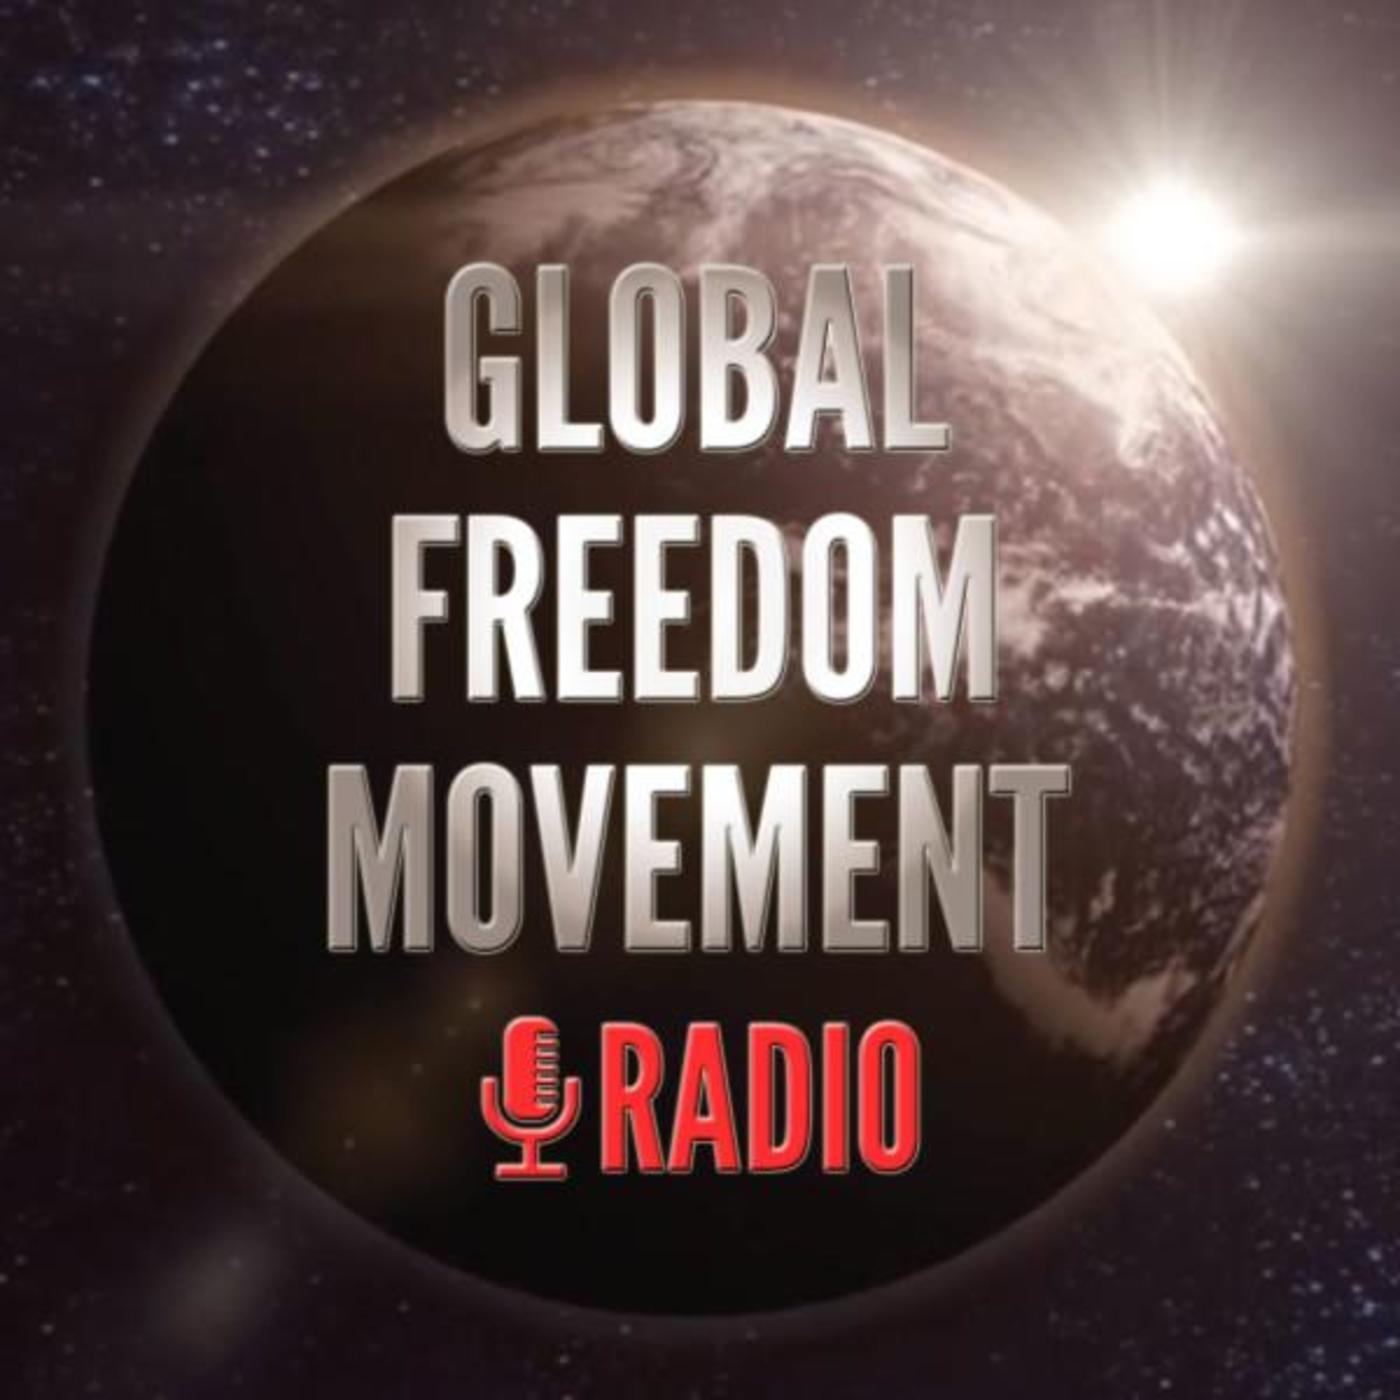 Global Freedom Movement Radio